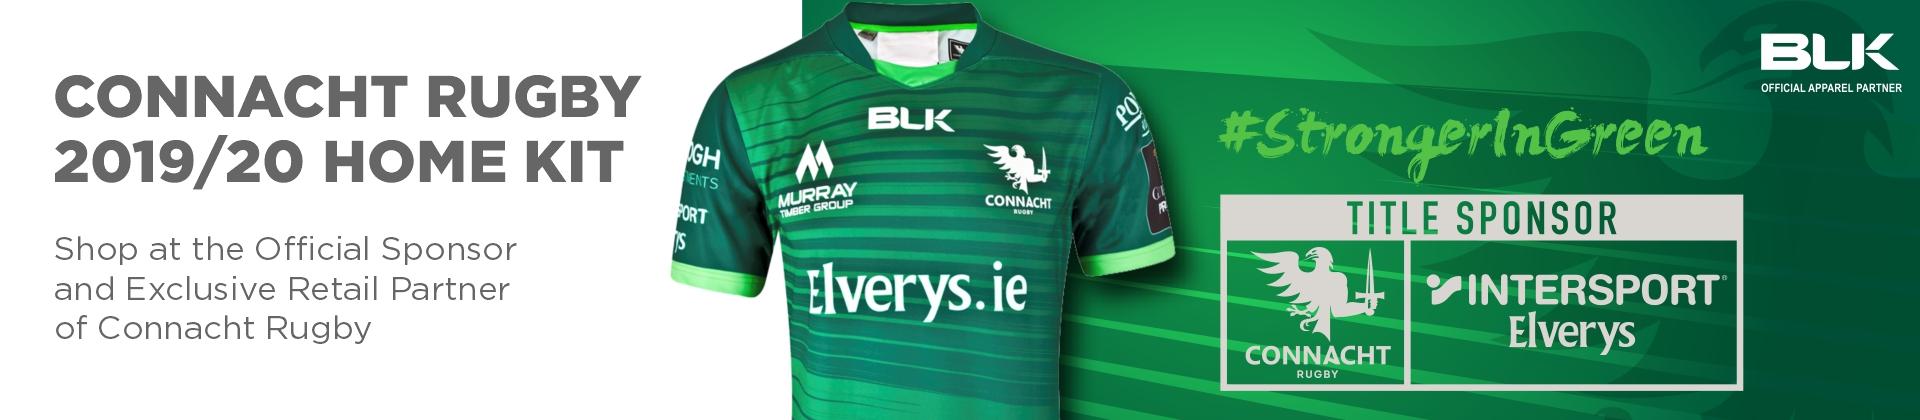 cfc66f49 Connacht Rugby Jerseys | Elverys | Exclusive Retail Partner | Rugby |  Elverys | Elverys Site